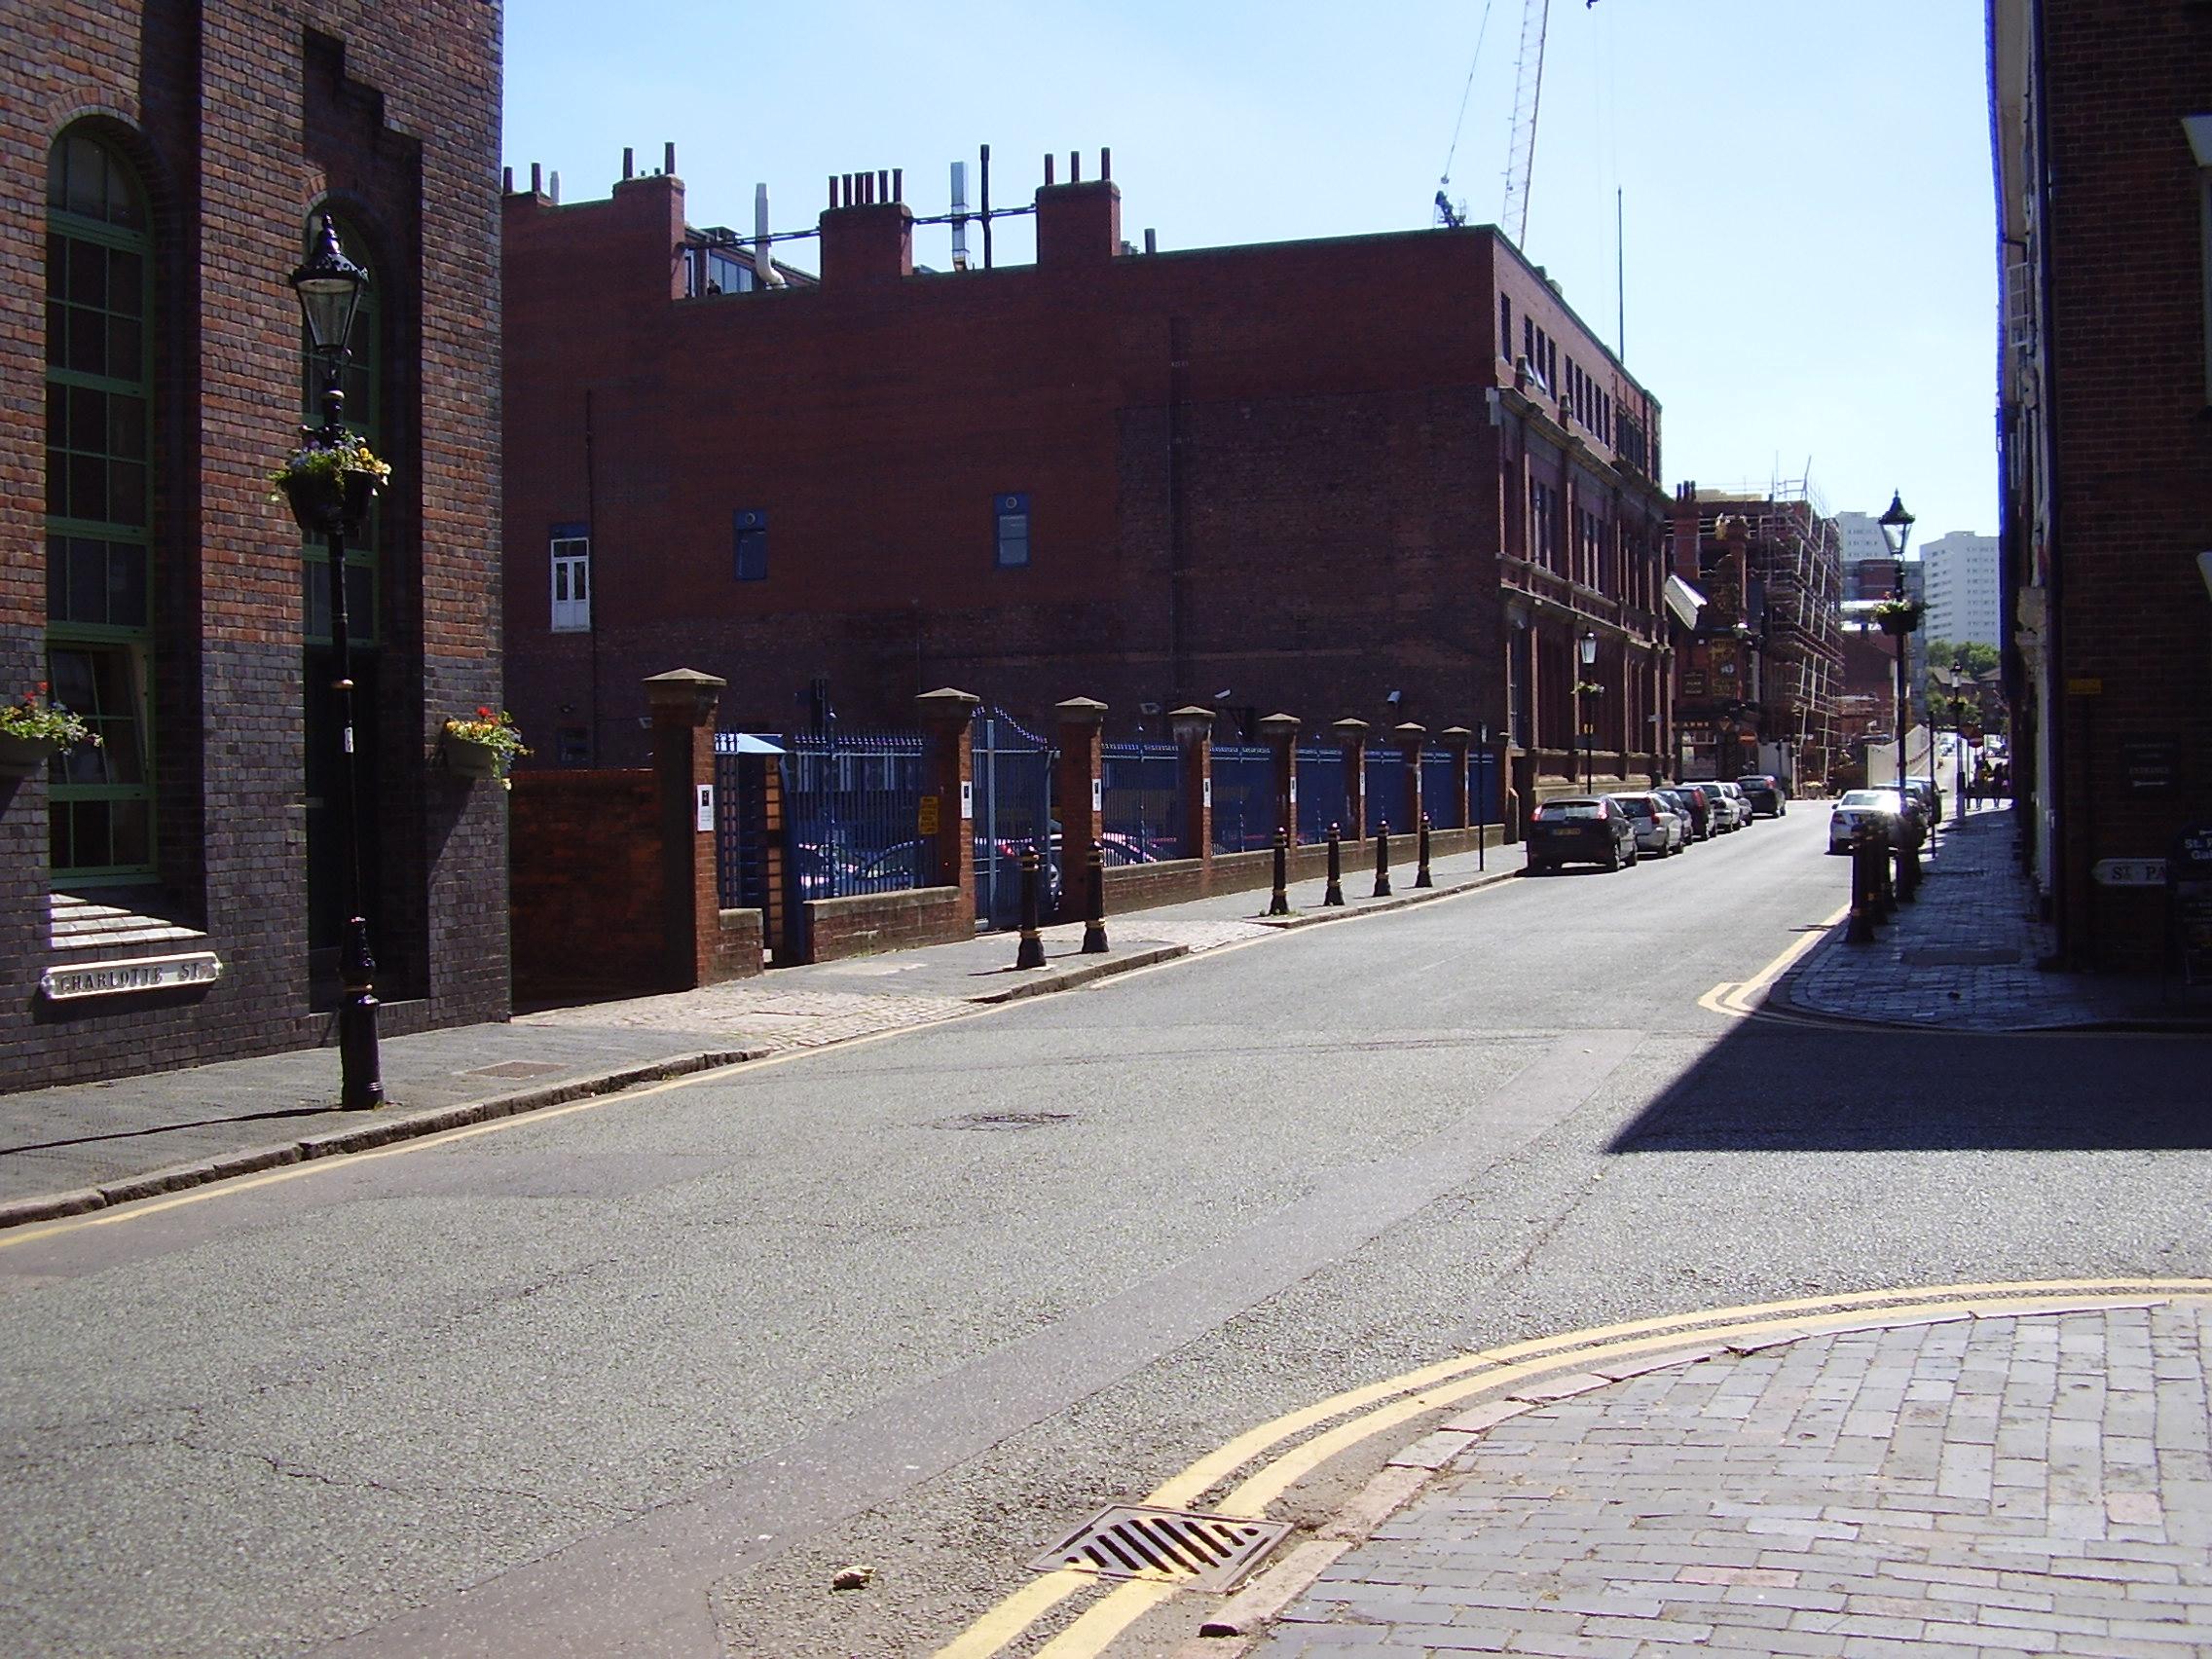 2008 Street view photo 1 of the Jewellery Quarter Birmingham